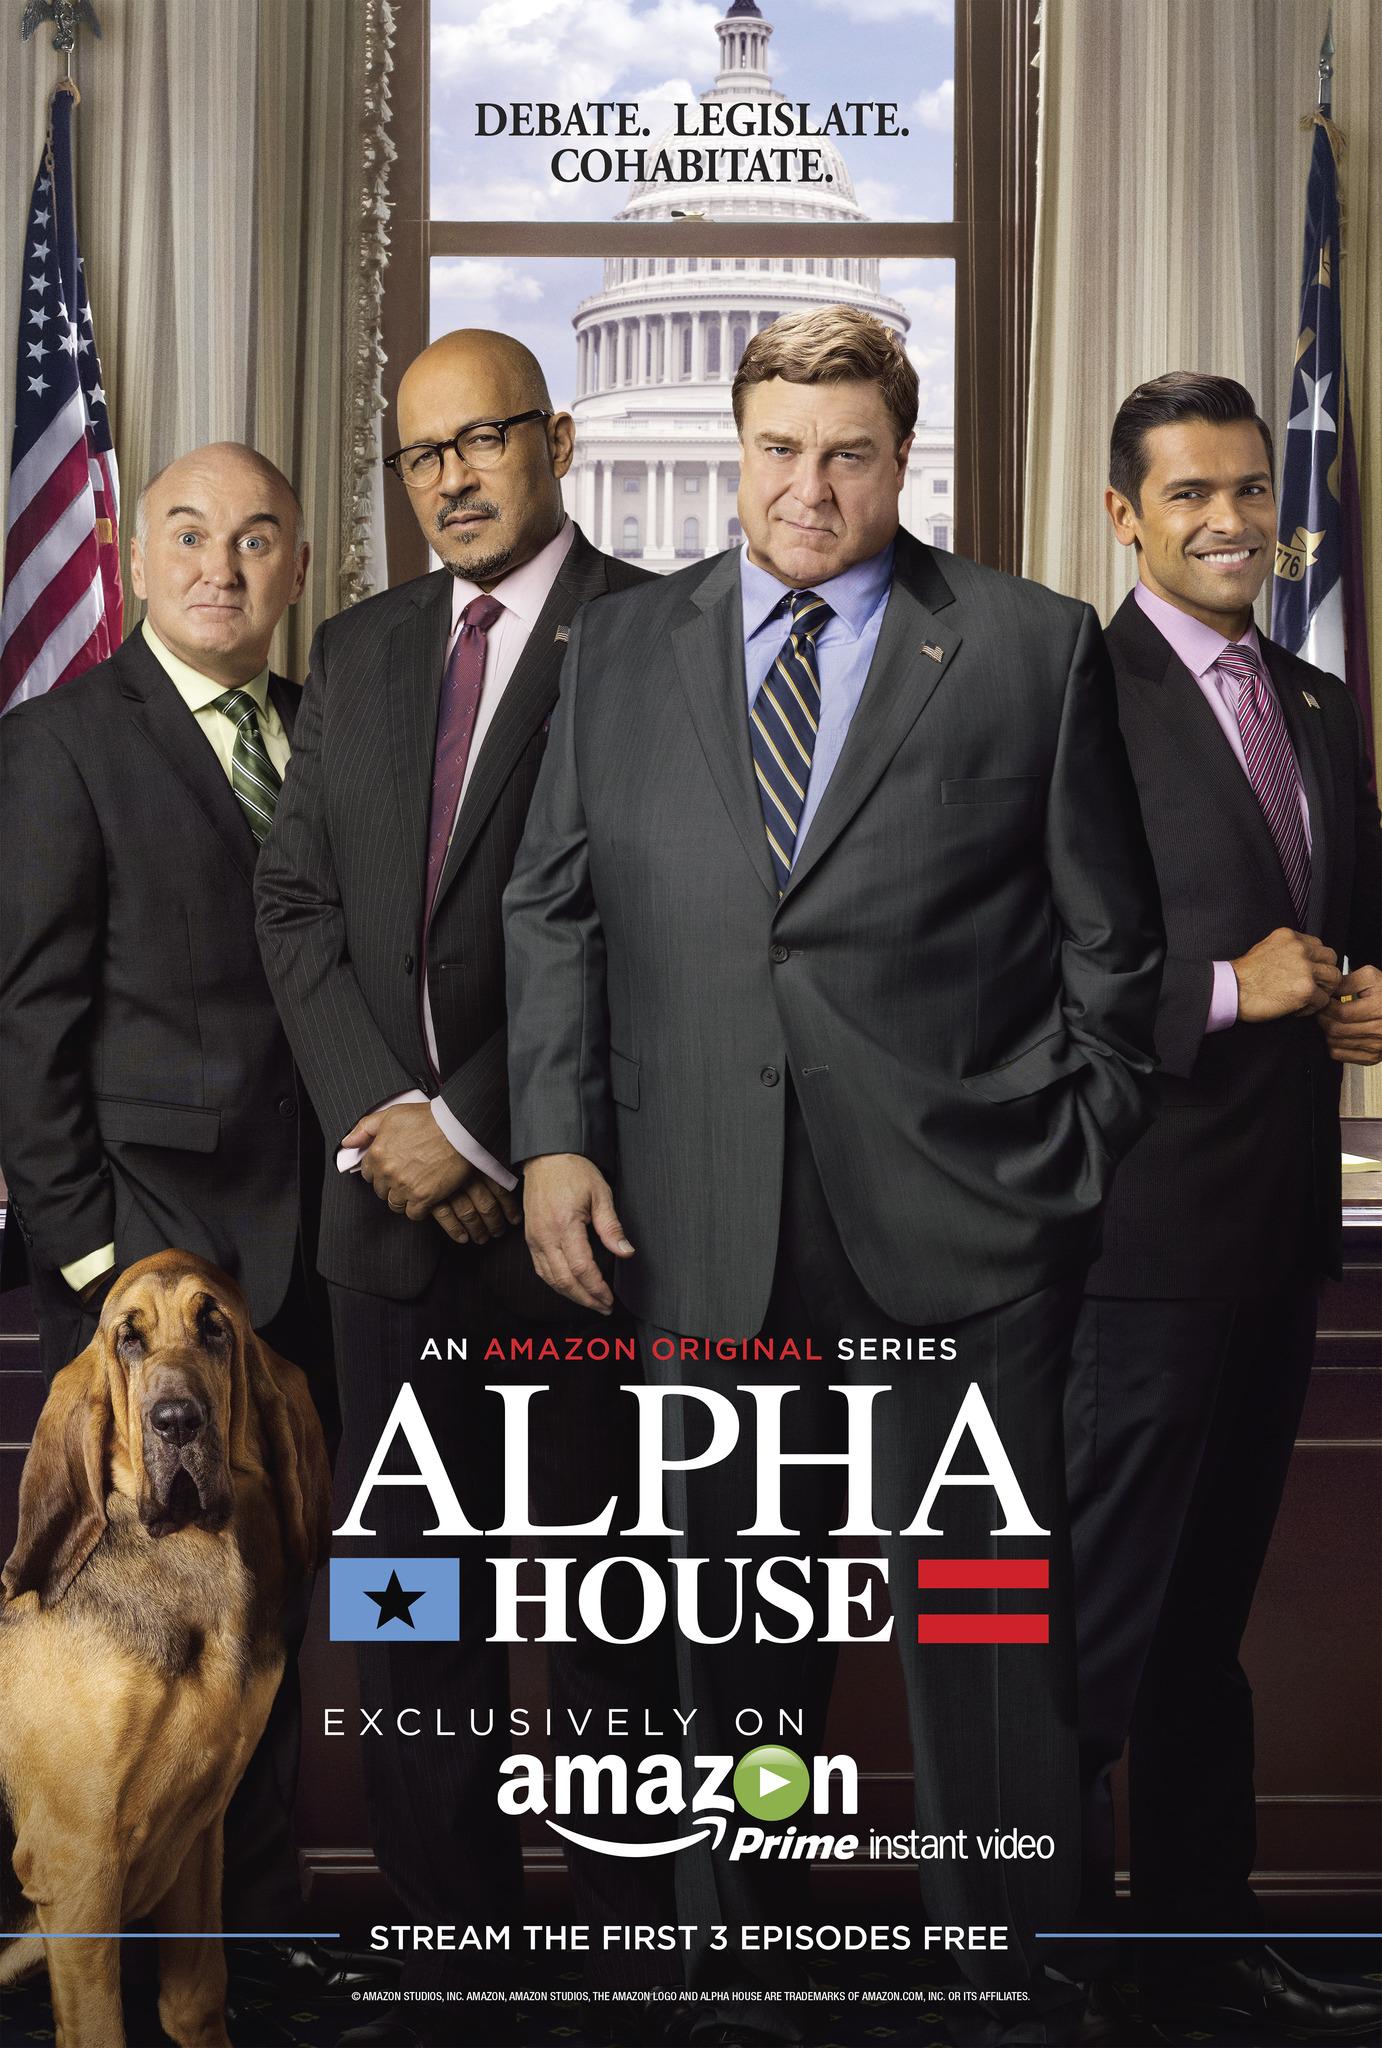 Alpha House - Alpha House (2013) - Film serial - CineMagia.ro